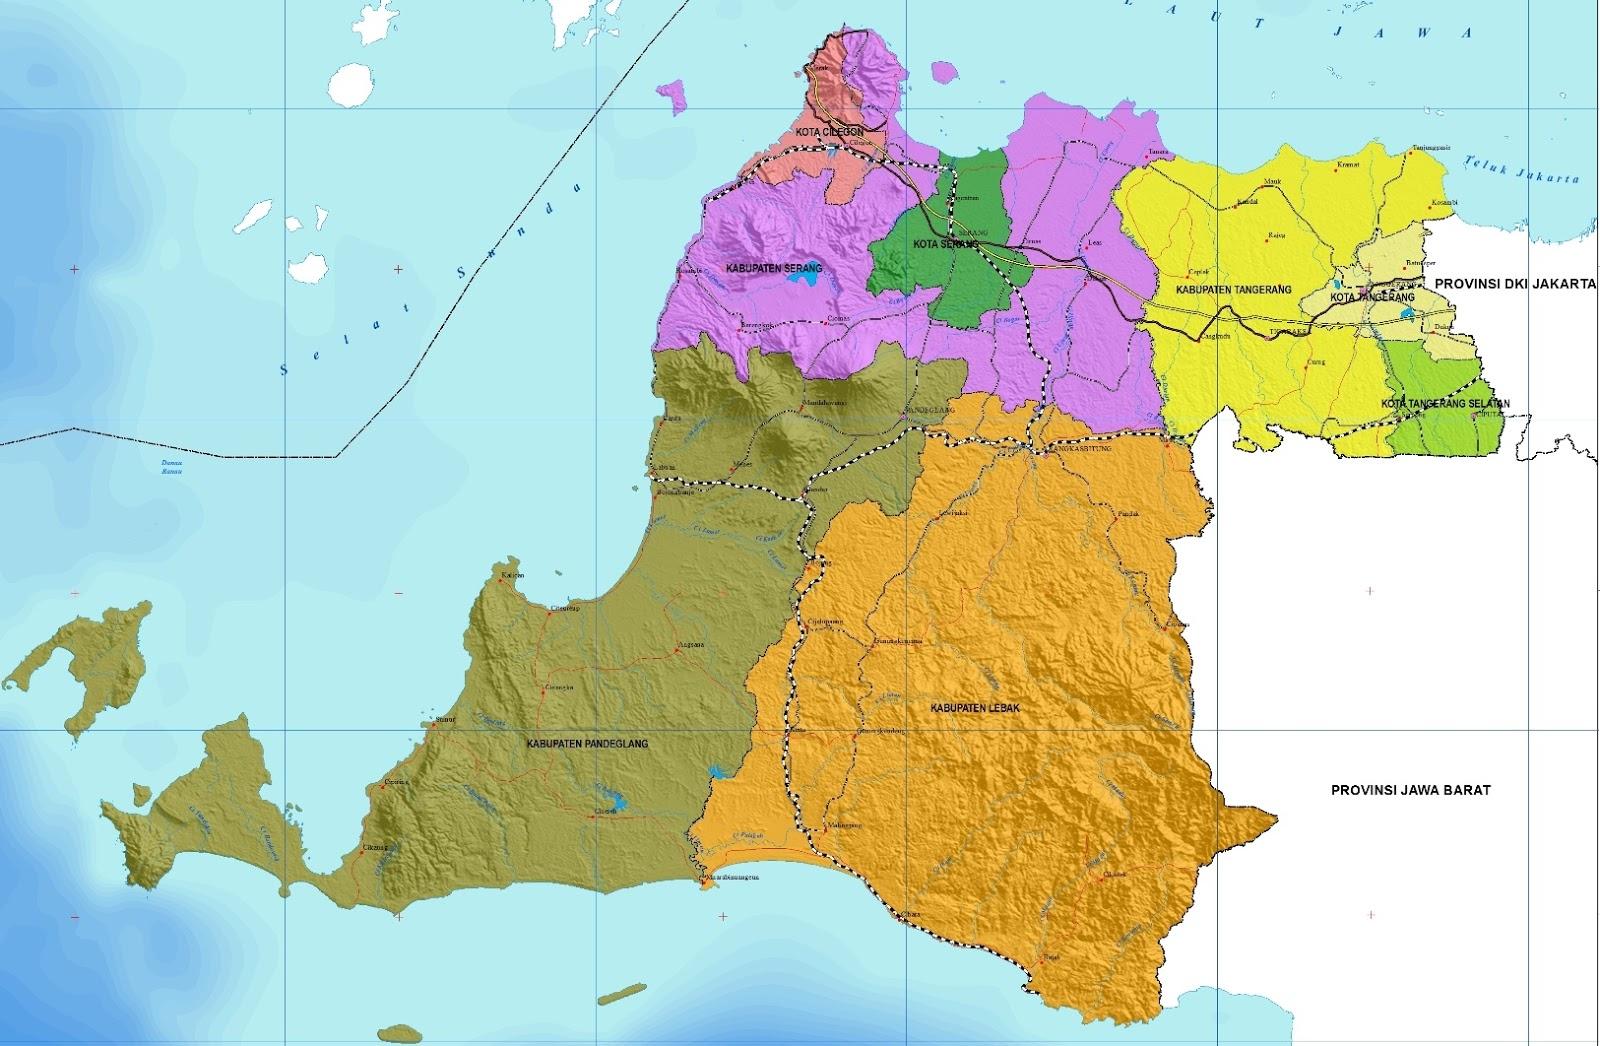 Peta Banten Lengkap Beserta Keterangan Gambarnya Gambar Kabupaten Kota Provinsi